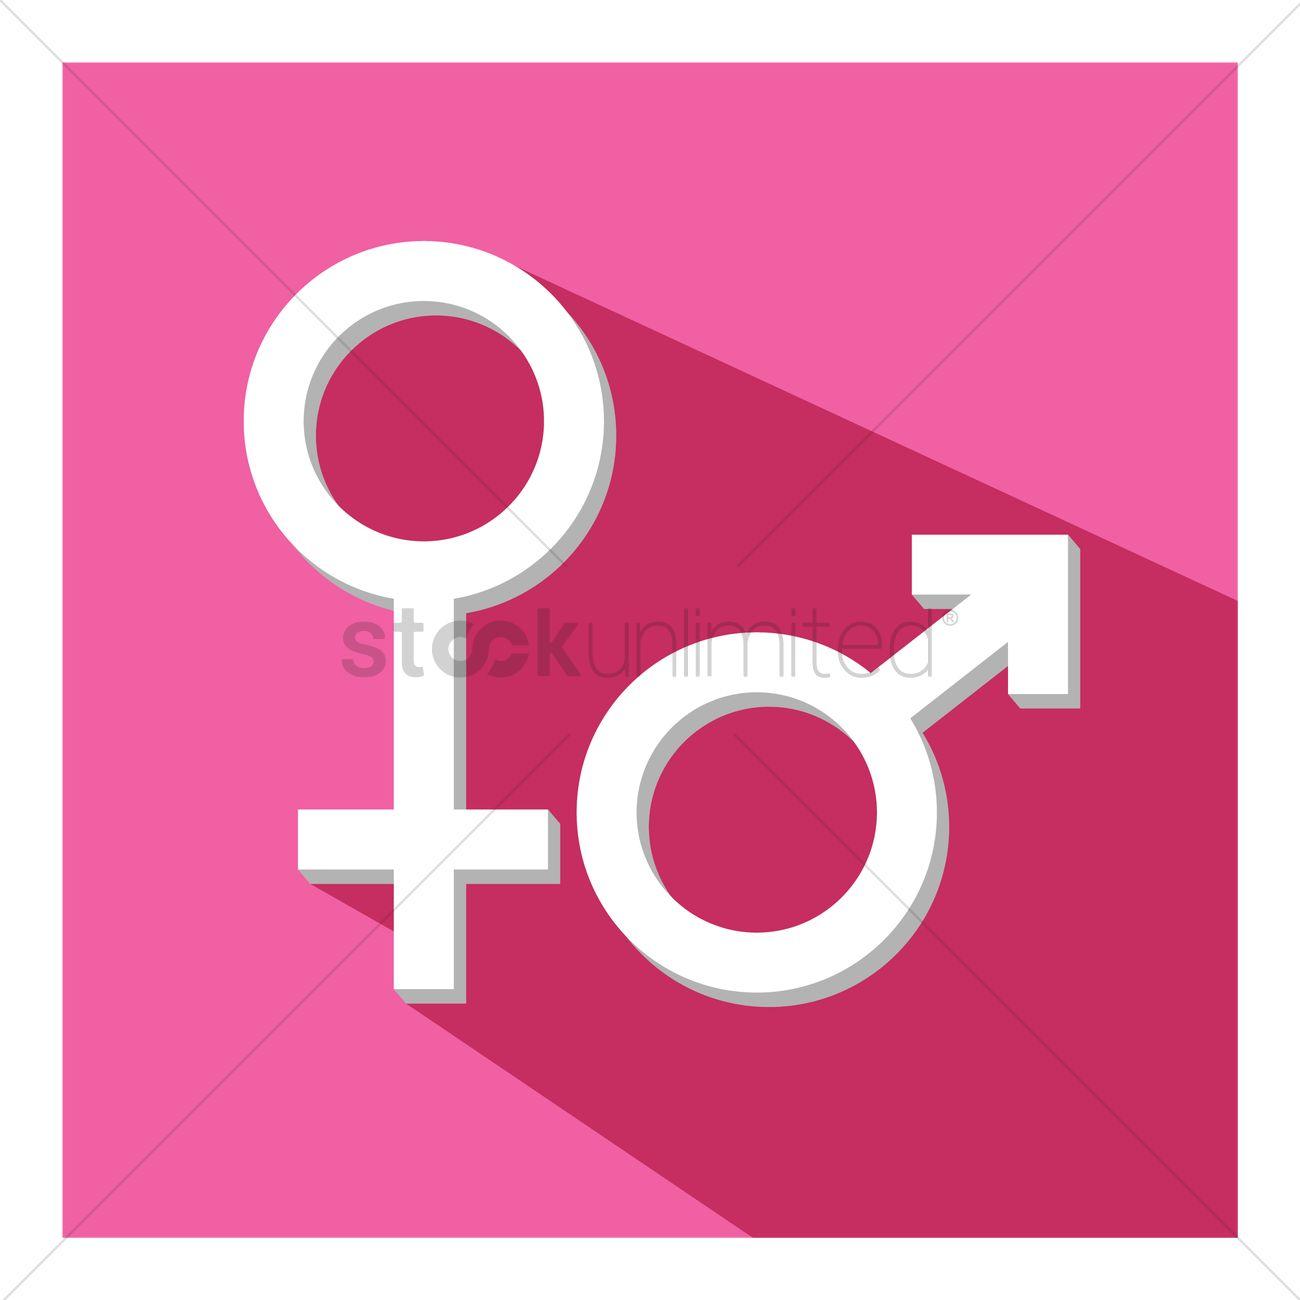 Free sex symbols